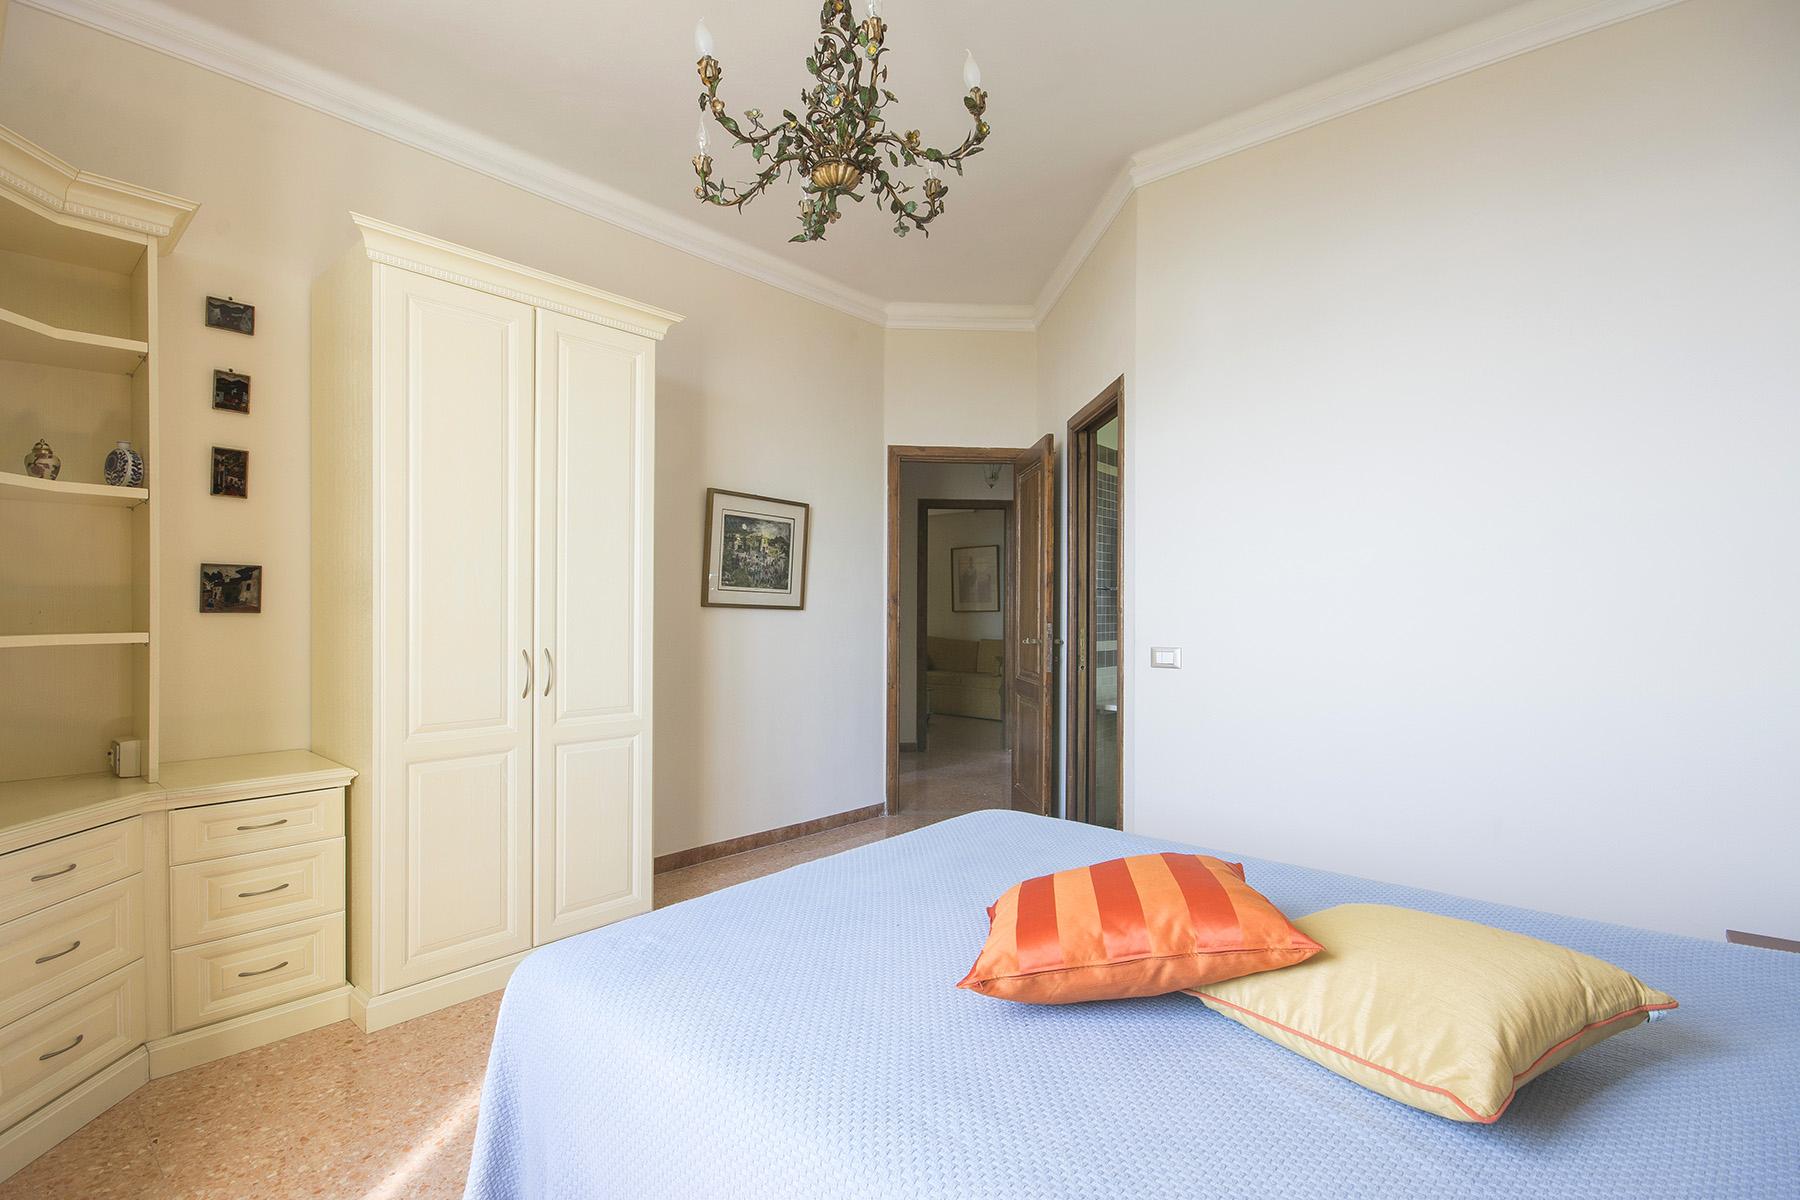 Villa in Vendita a Lerici: 5 locali, 580 mq - Foto 18